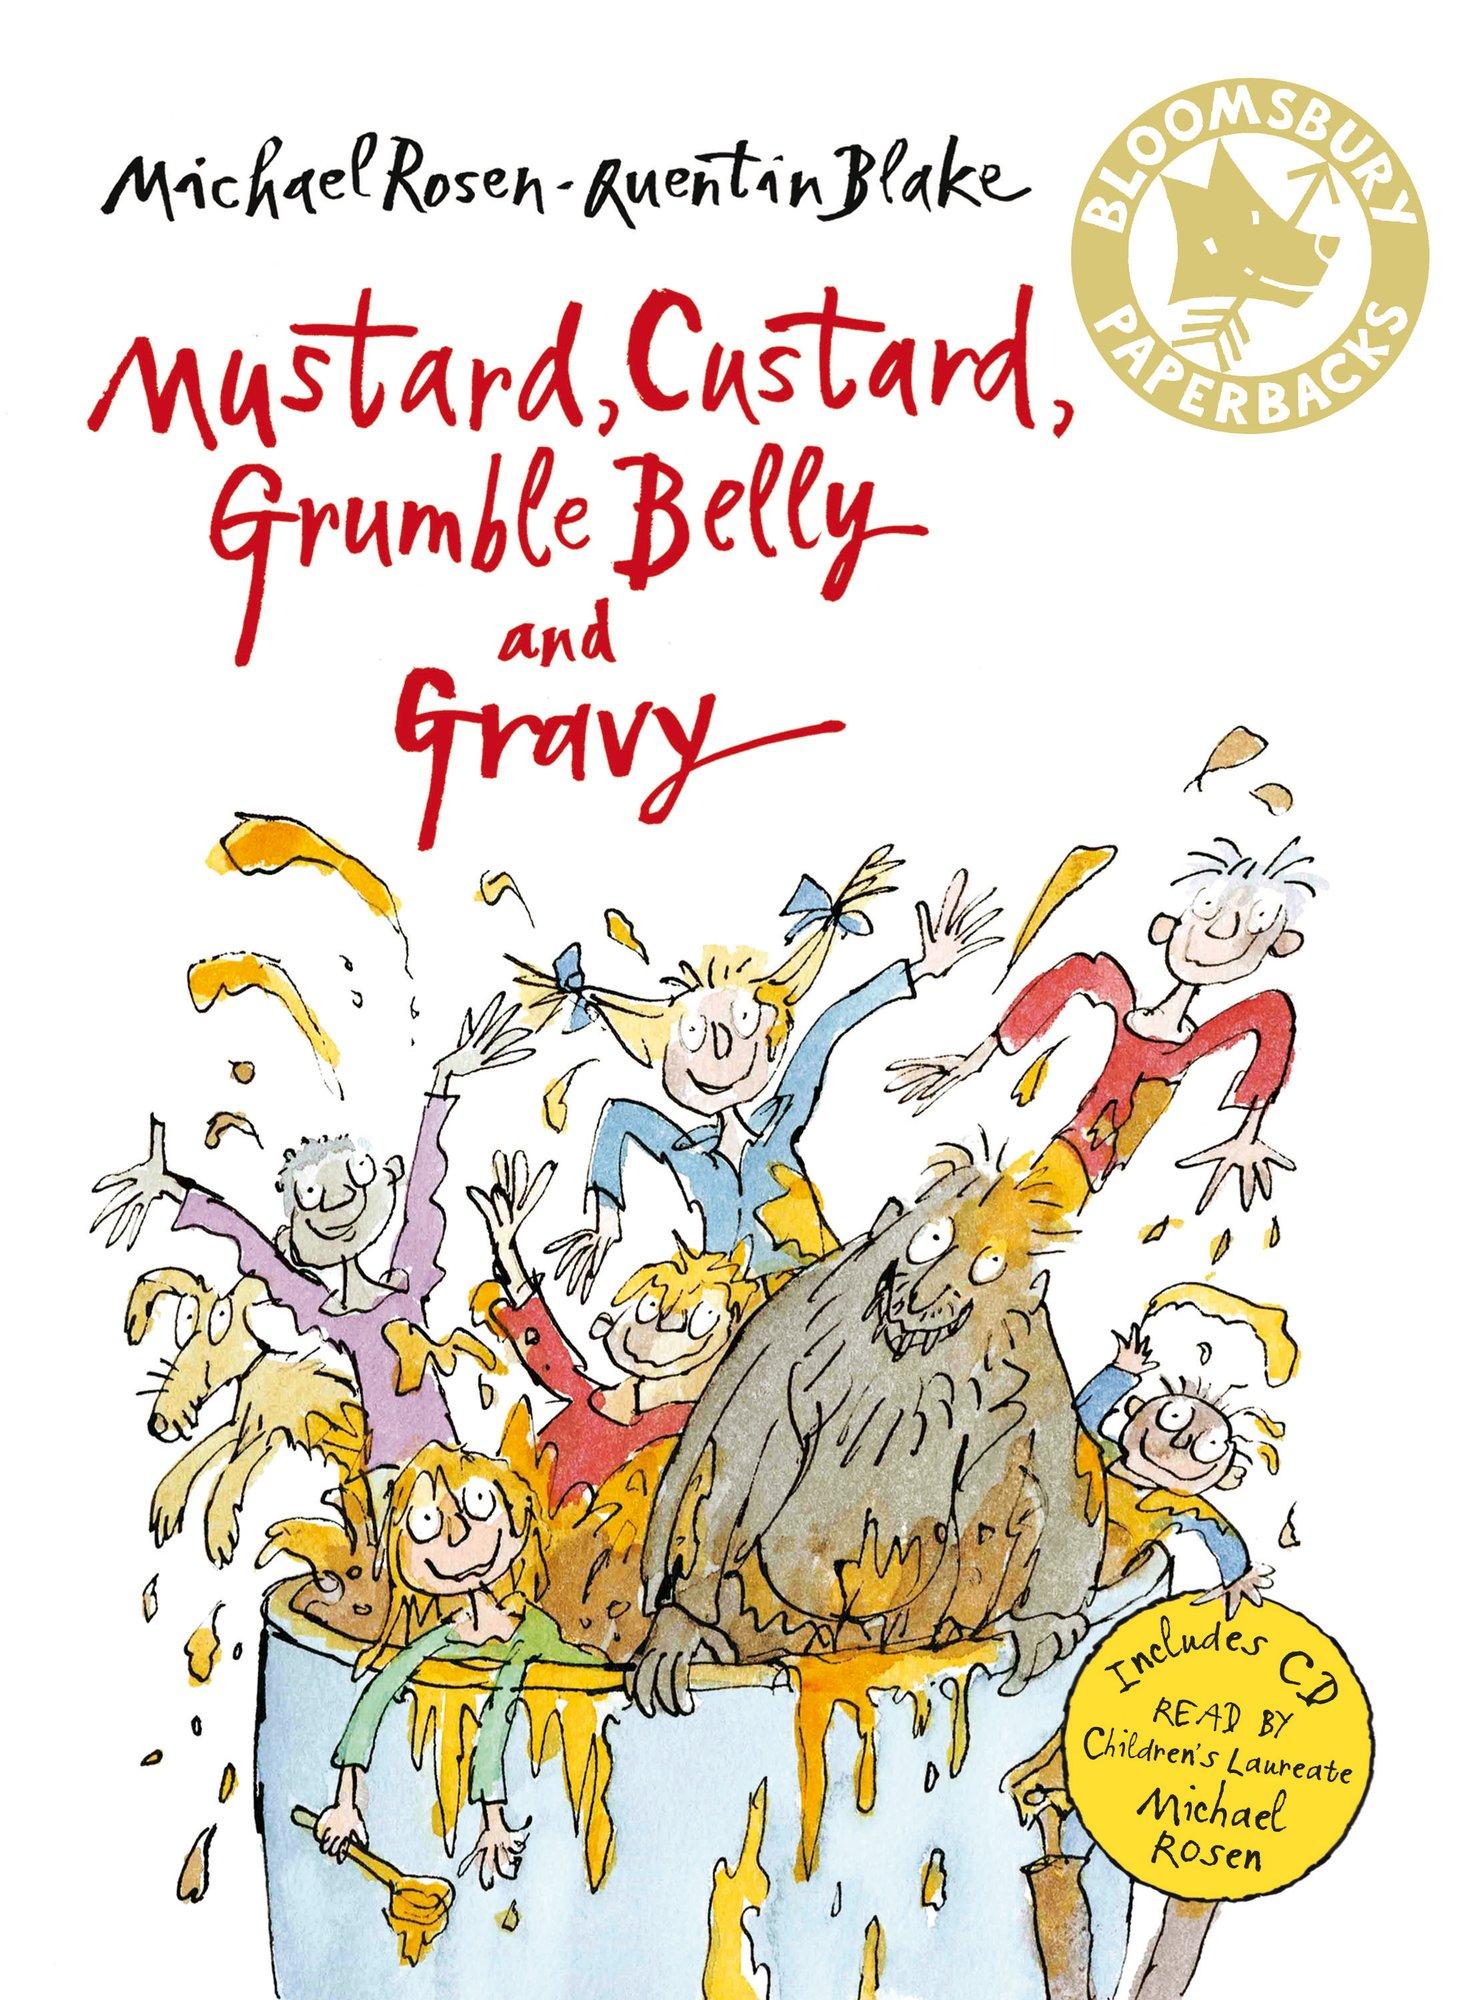 Mustard, Custard, Grumble Belly & Gravy | BookTrust